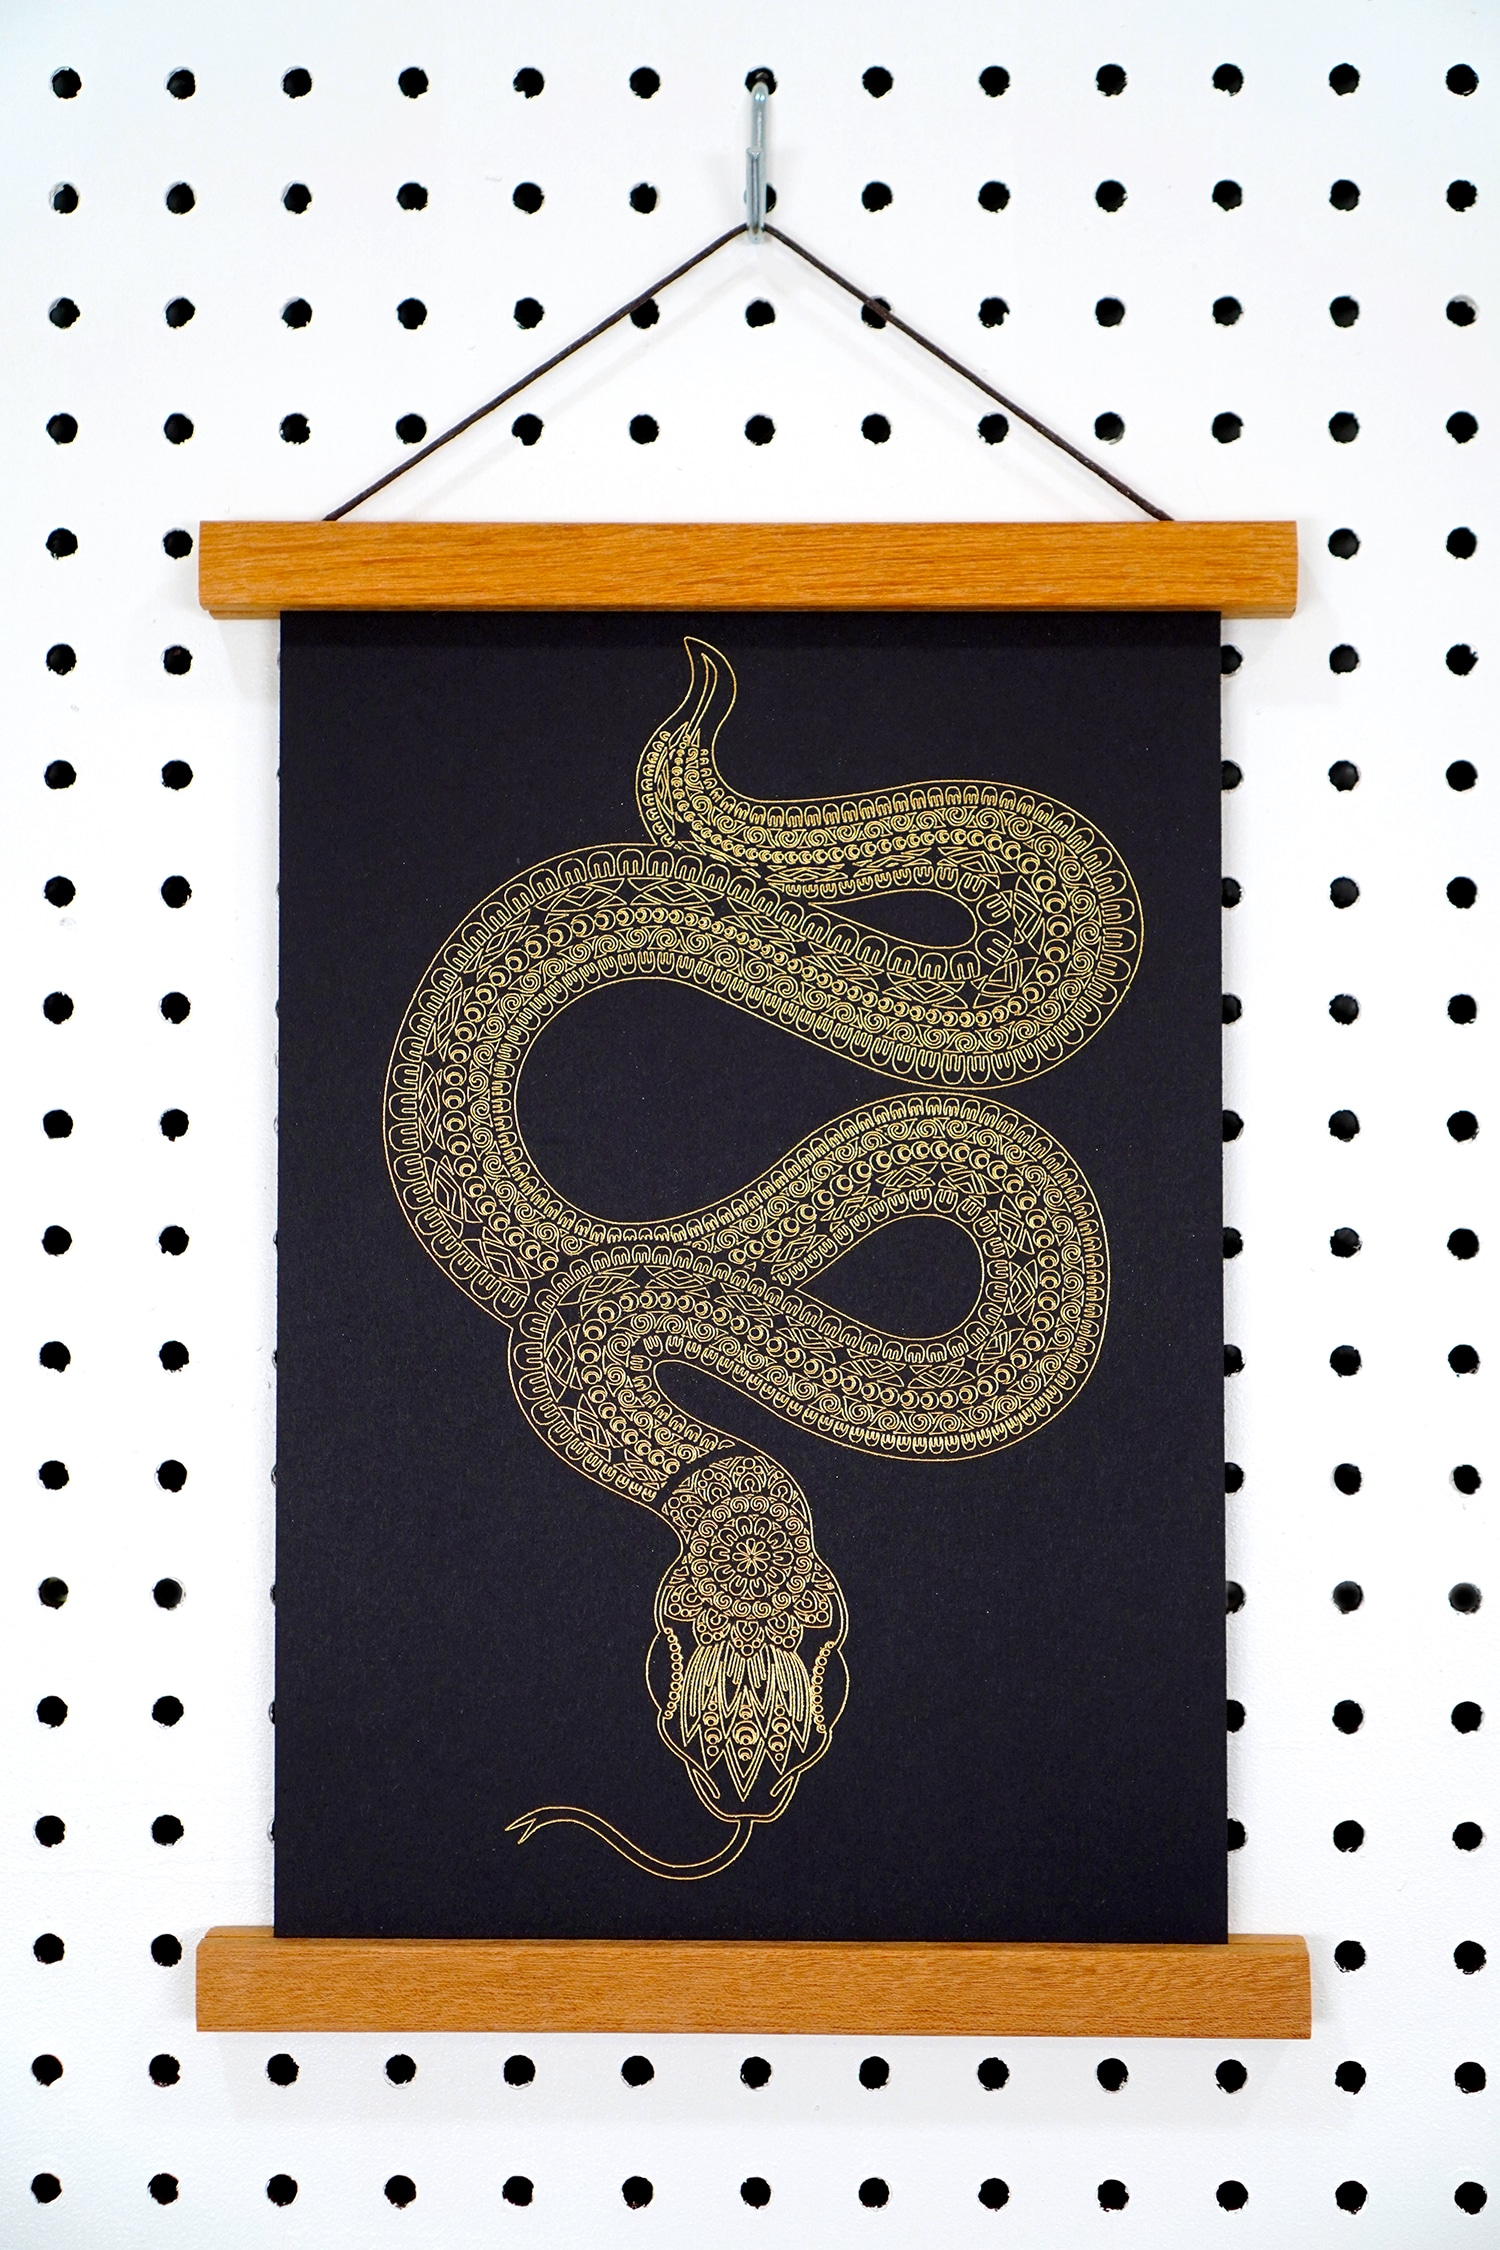 Gold foil art print of a snake with mandala design in wooden art hanger on pegboard